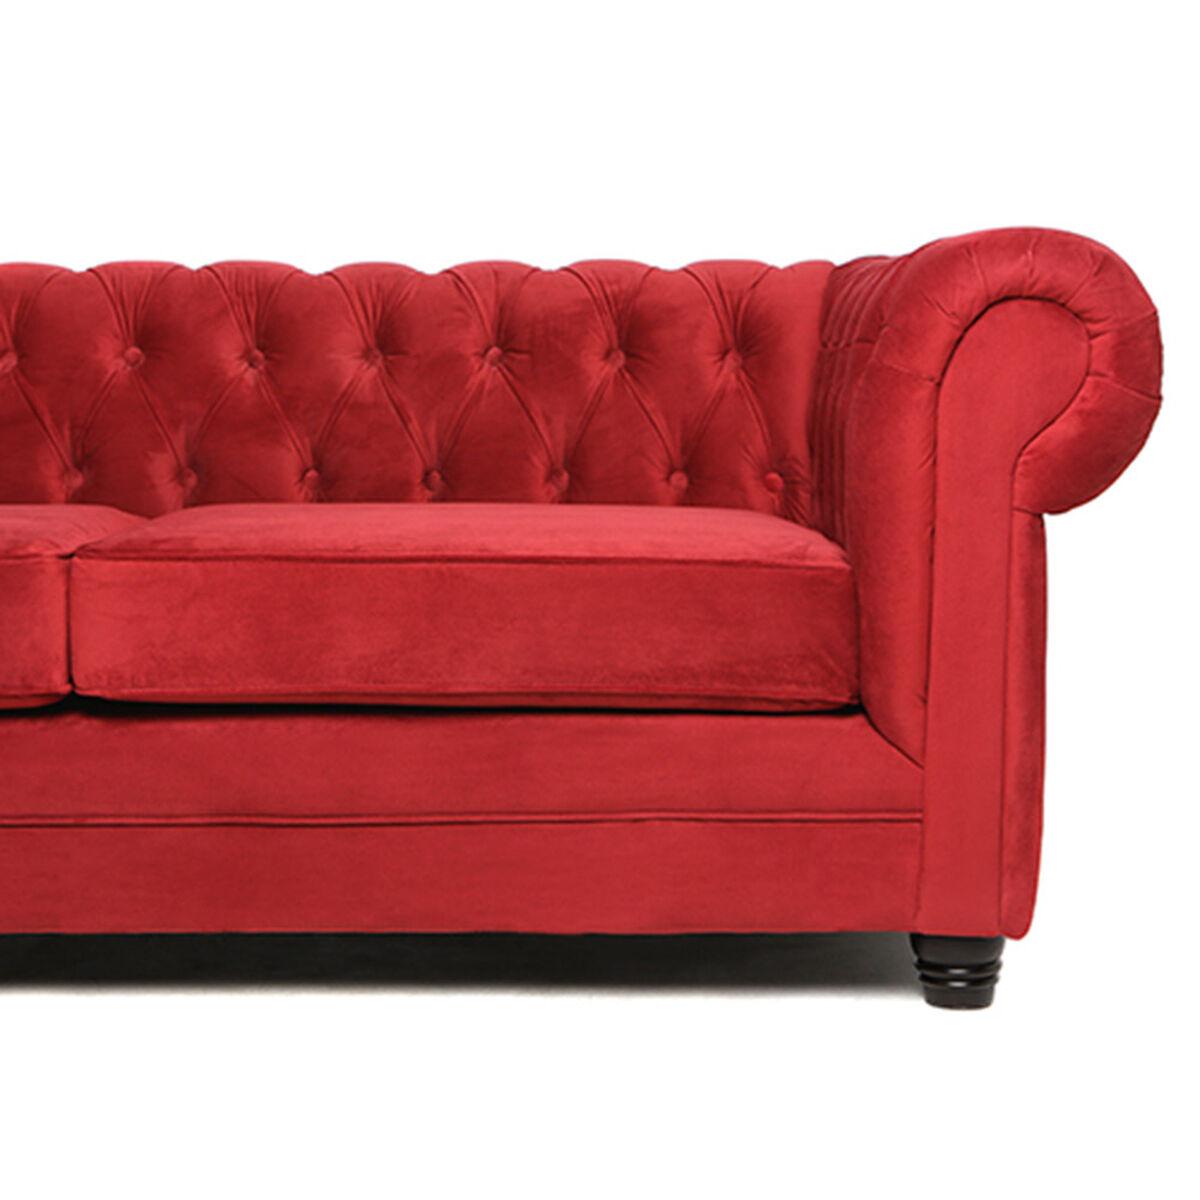 Sofa Chester 3 Cuerpos